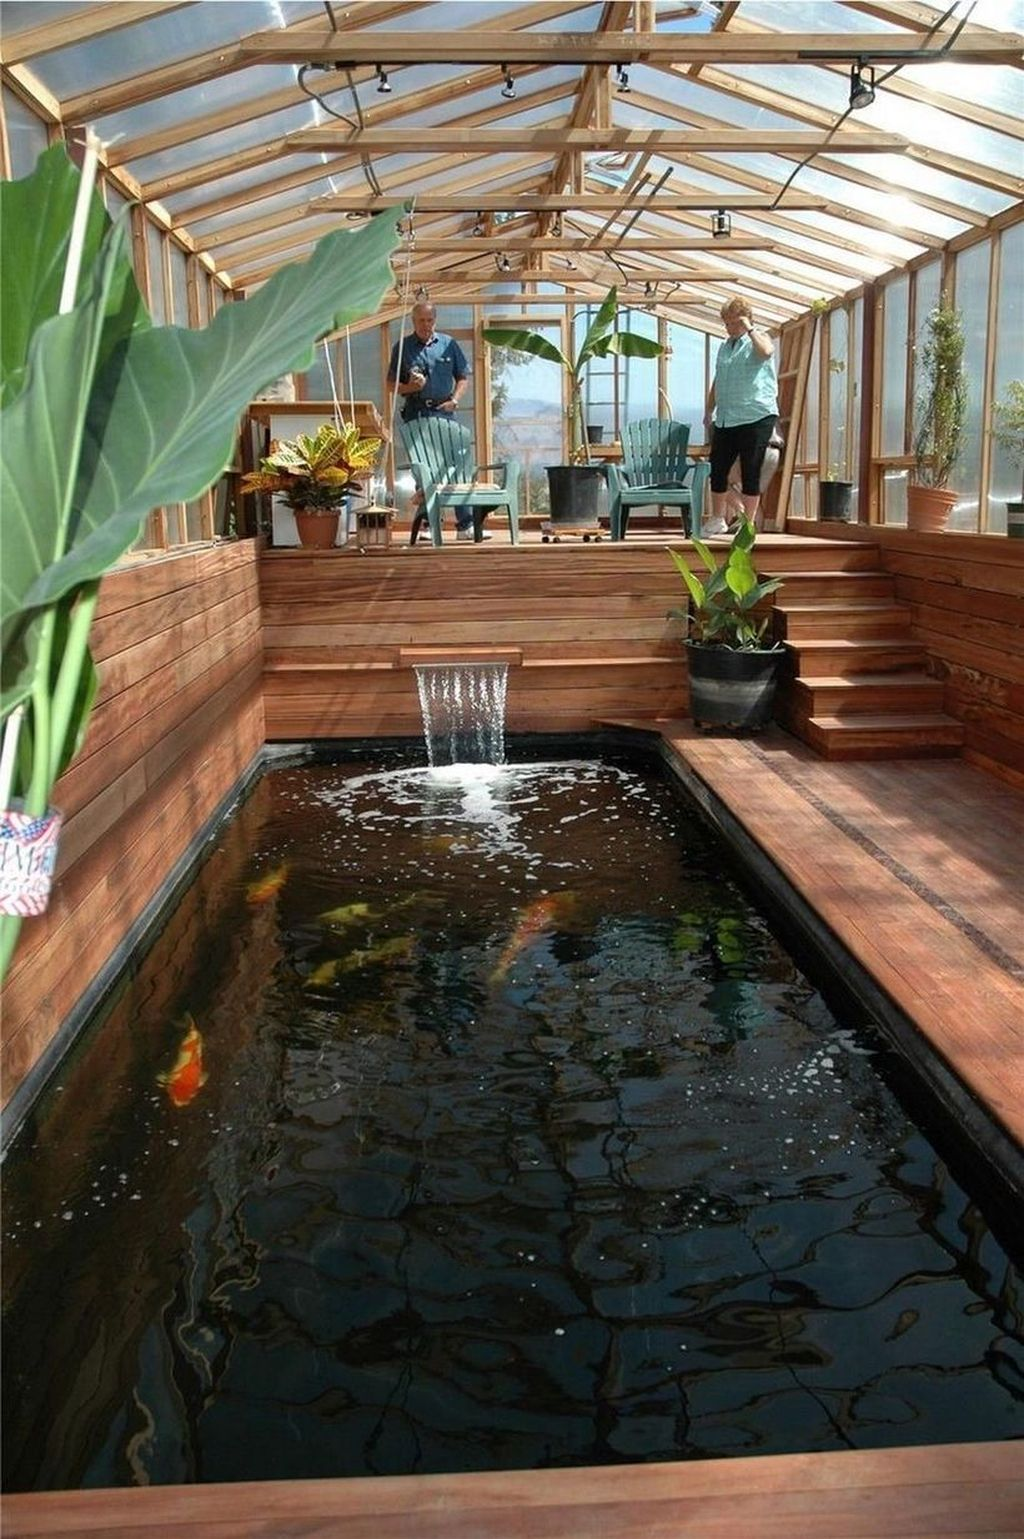 The Best Indoor Garden Ideas To Beautify Your Home 01